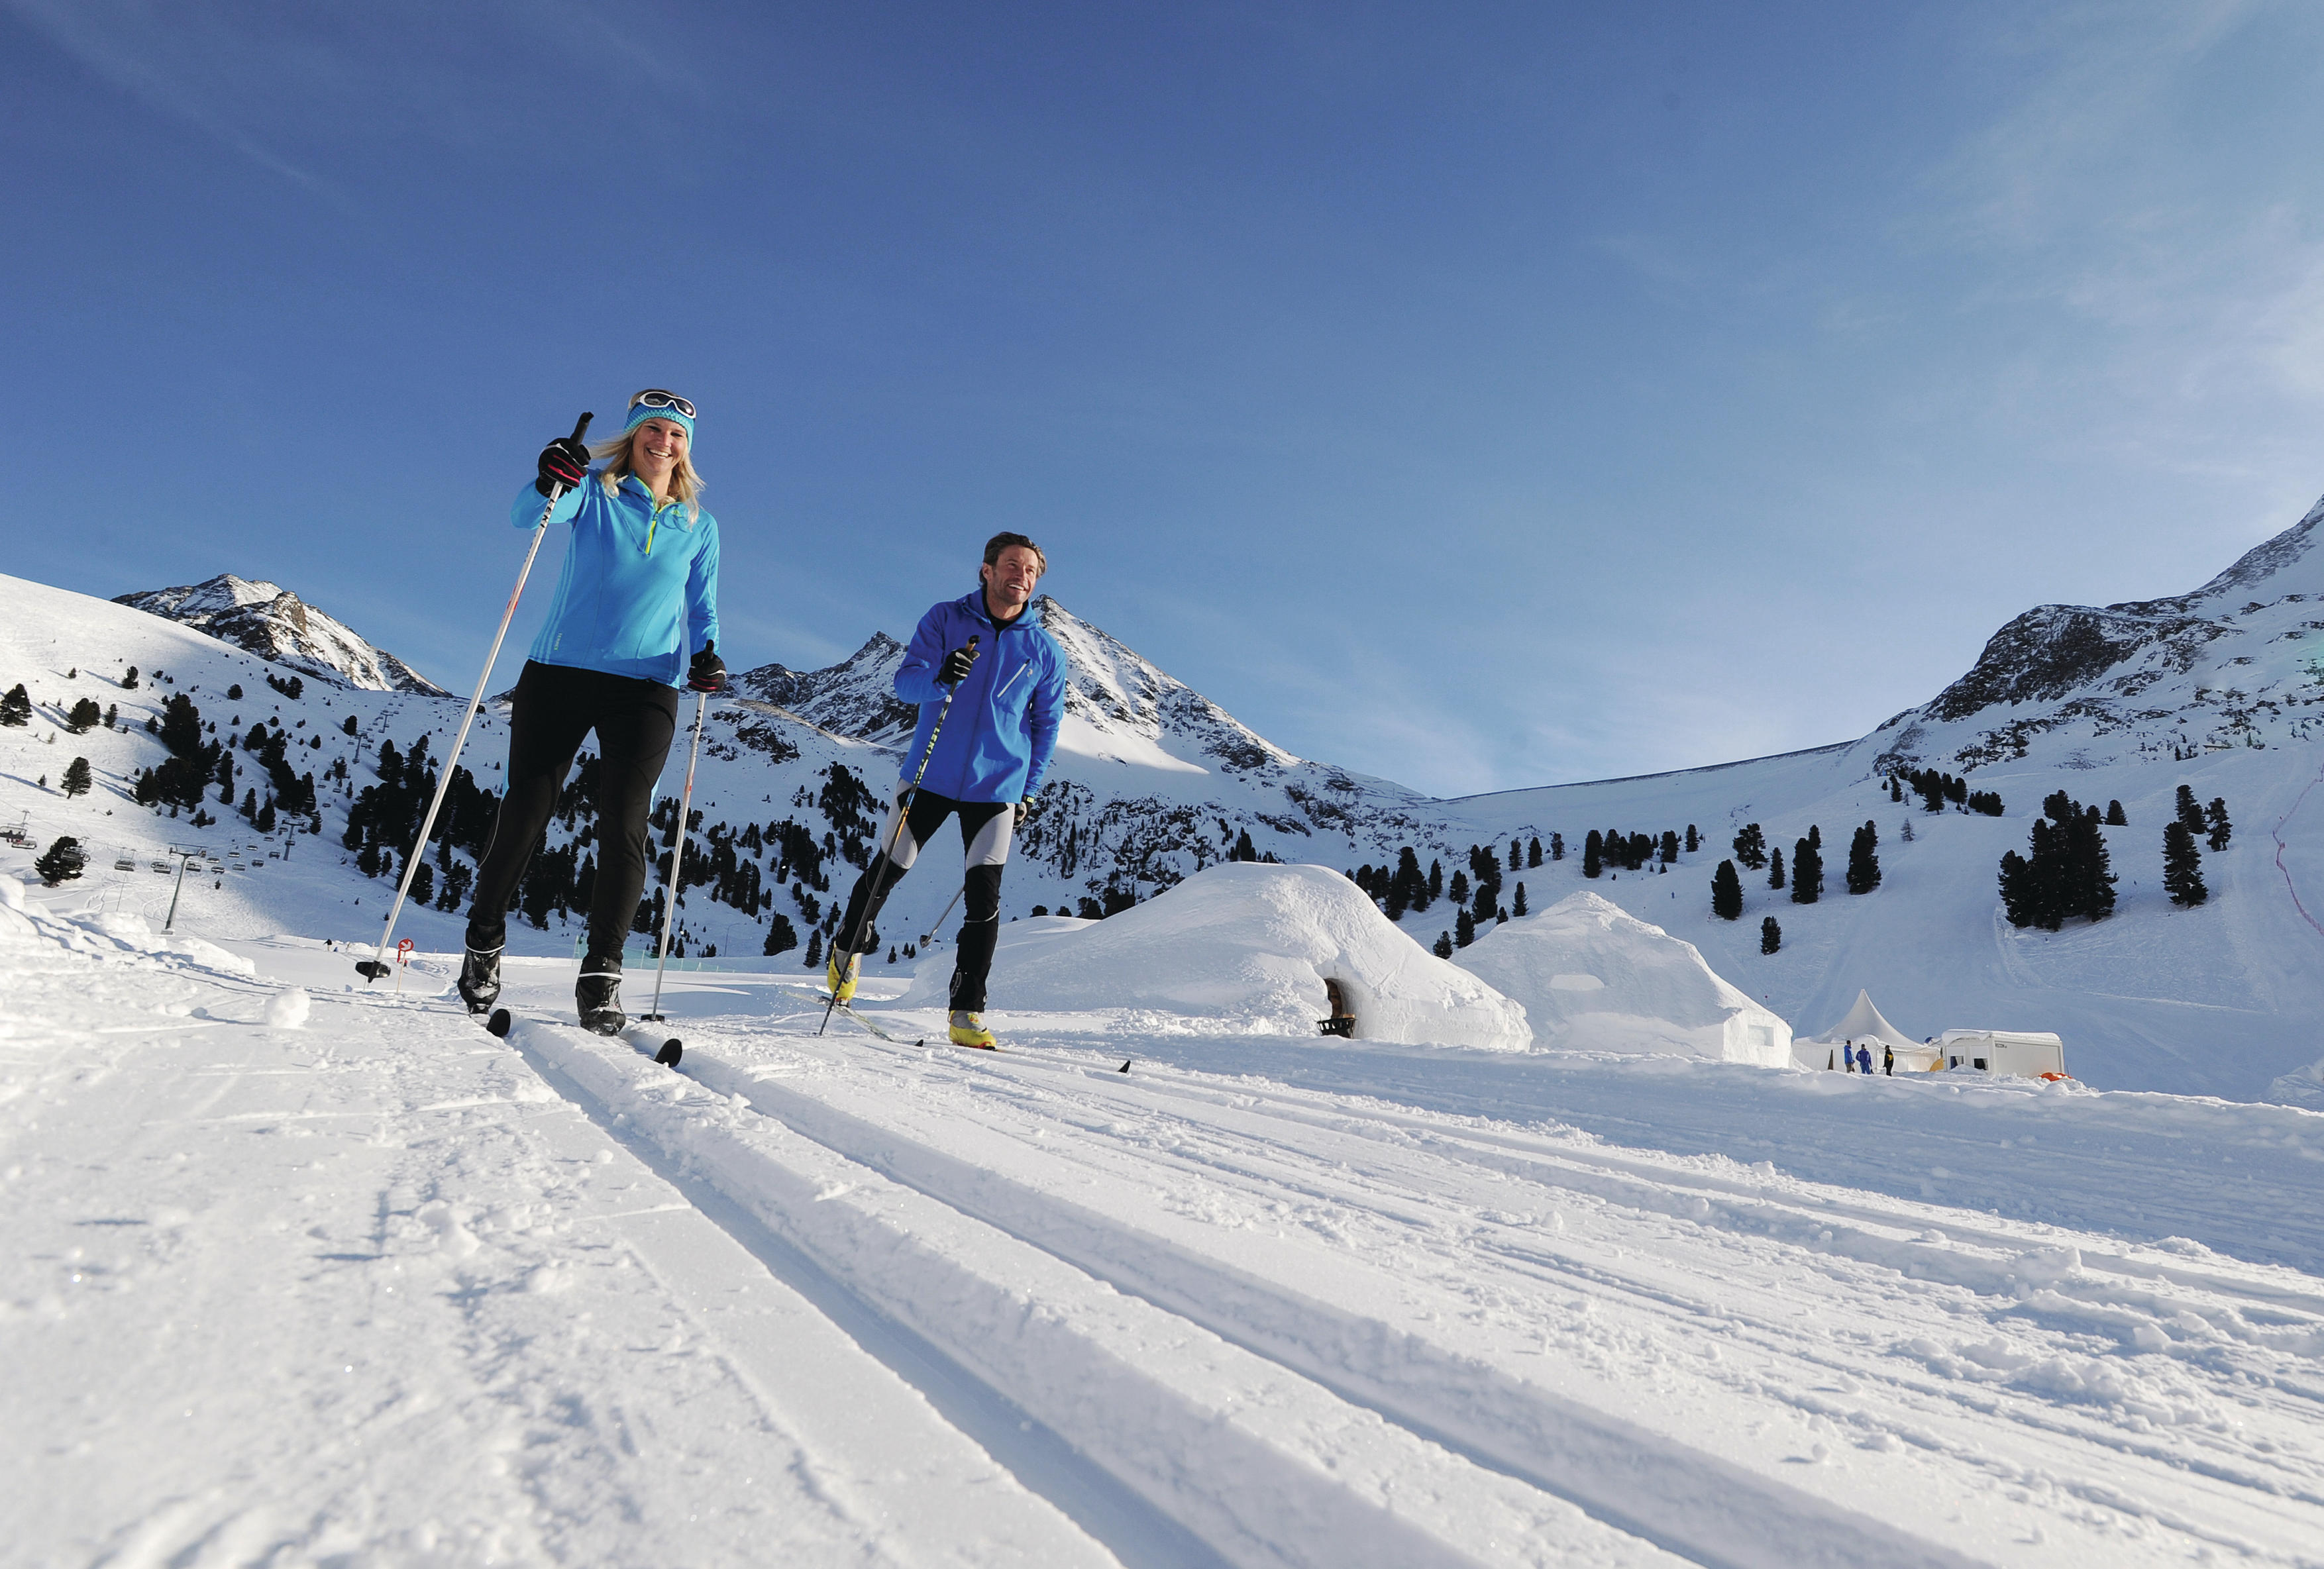 Ski in – Ski out – Ski free im Ski Resort Kühtai